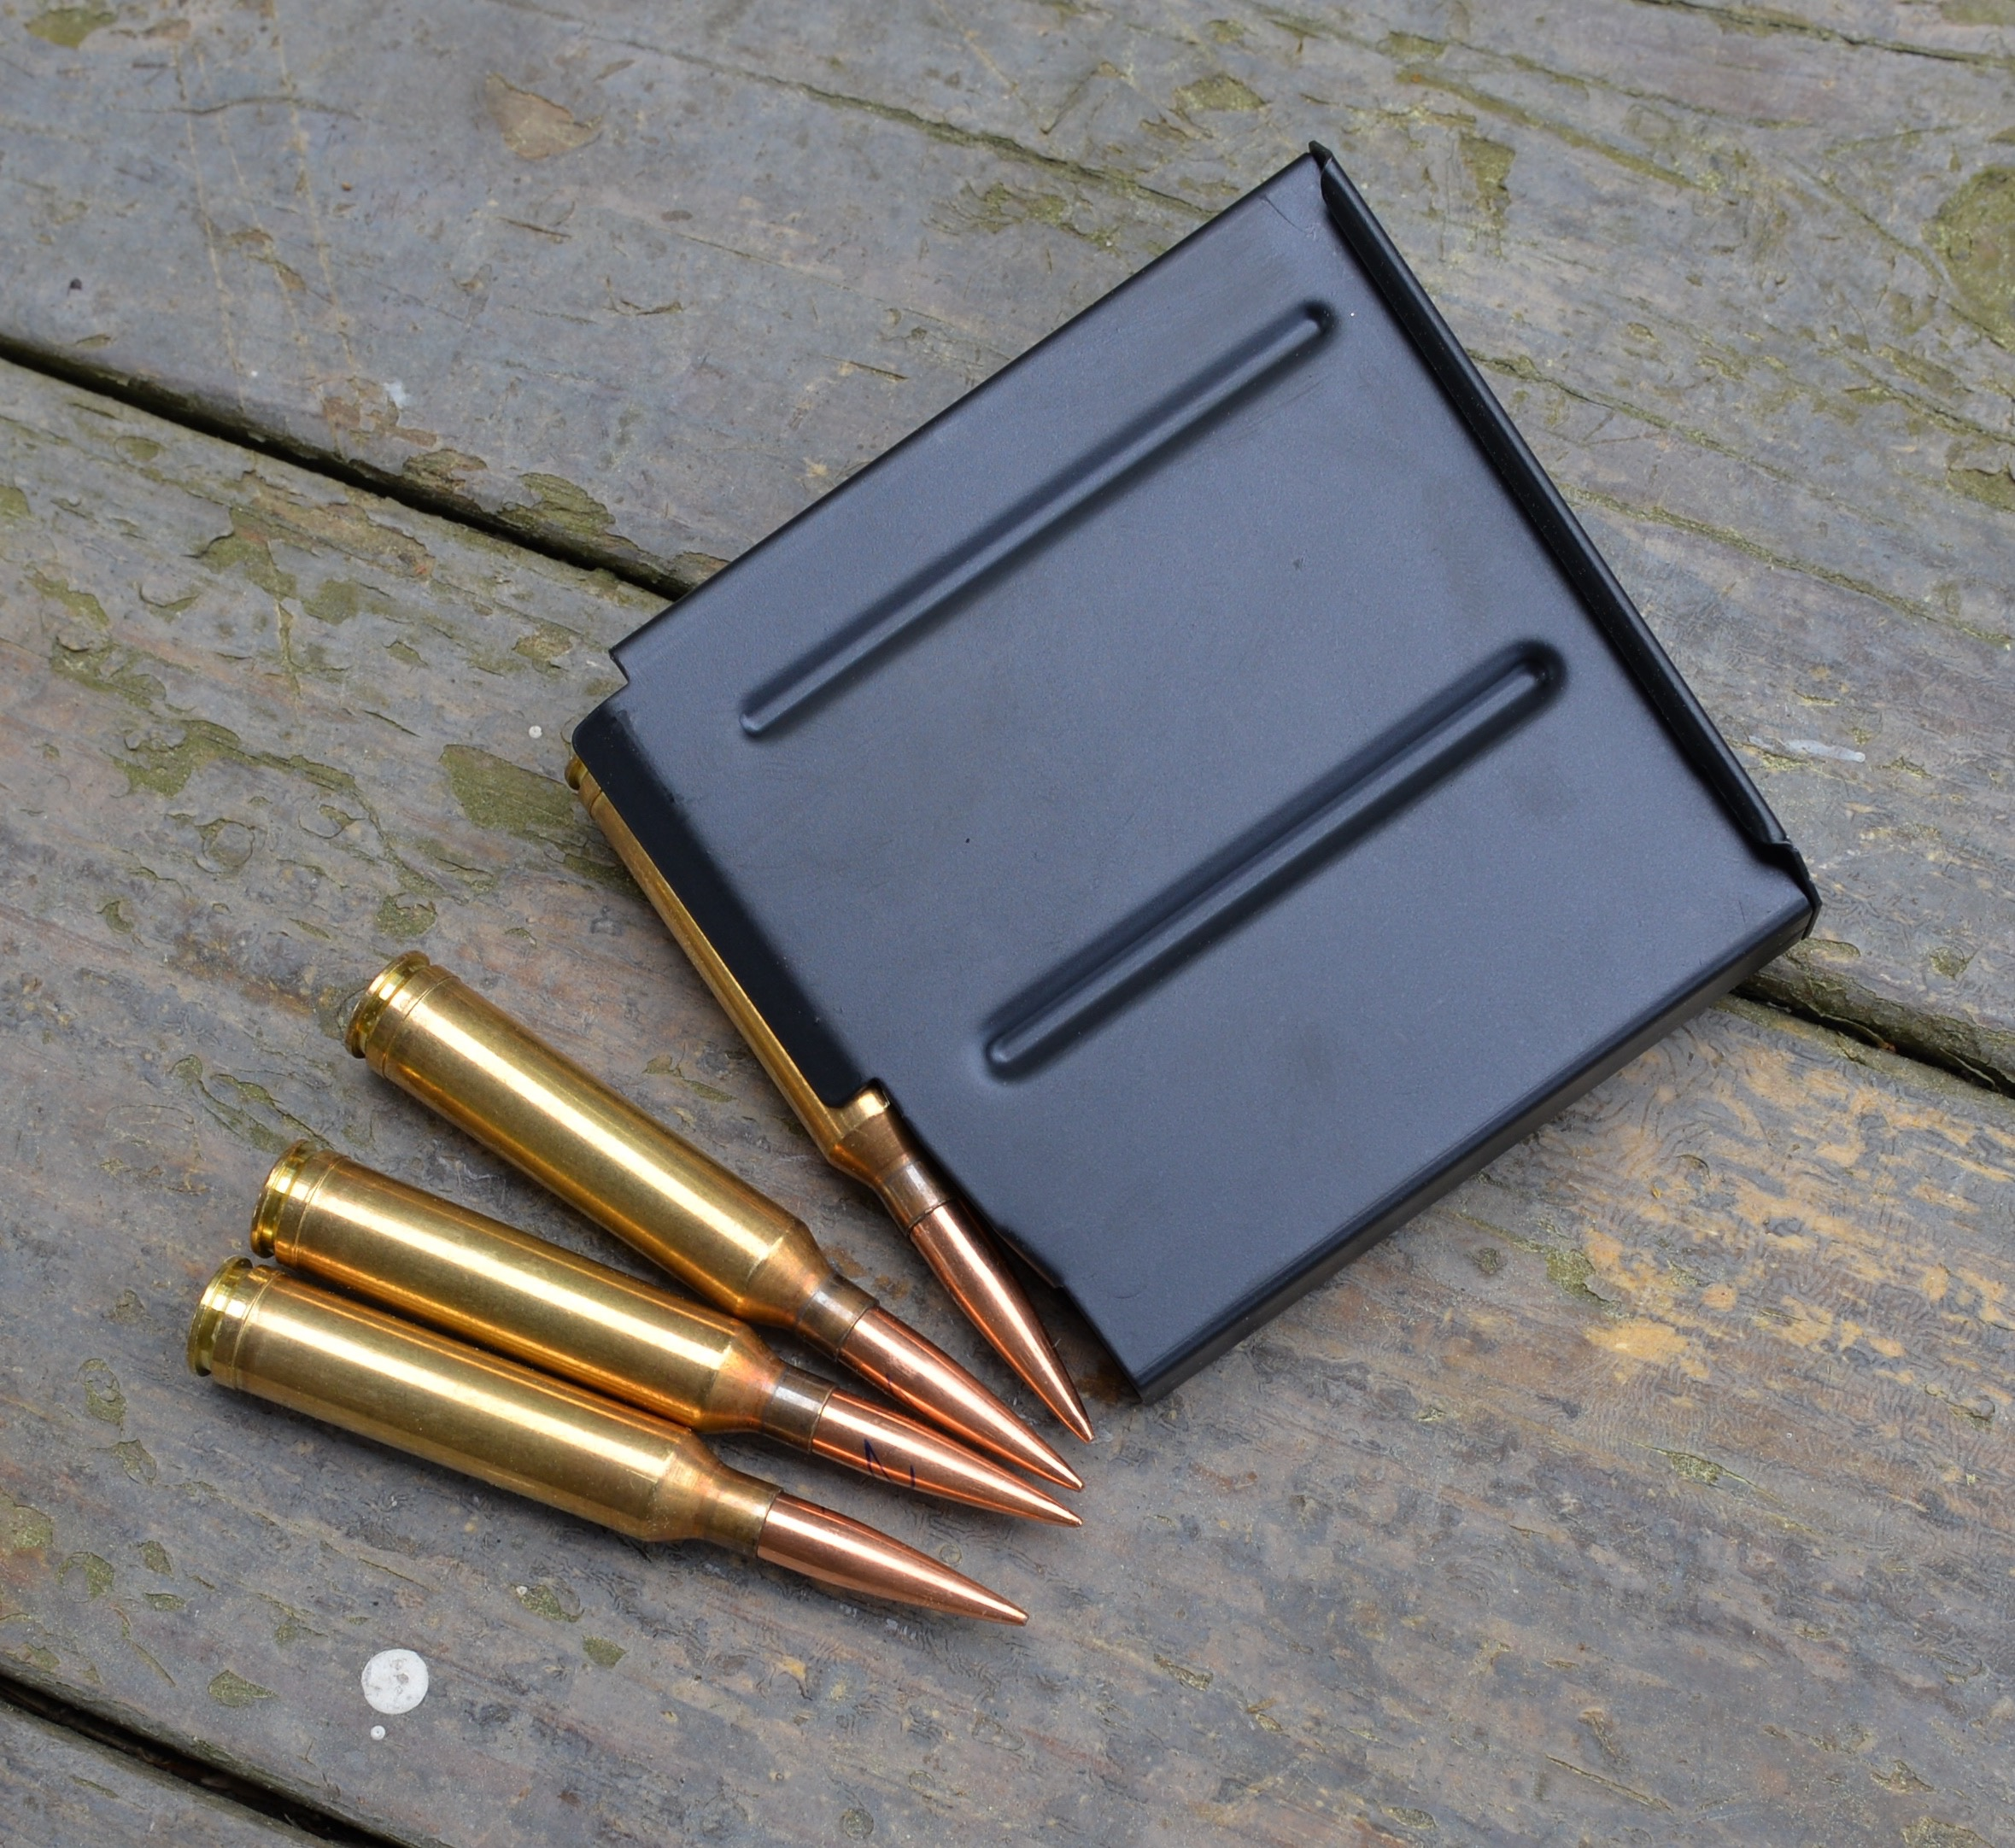 7mm Remington Magnum load development: 197 gr and 183 gr Sierra